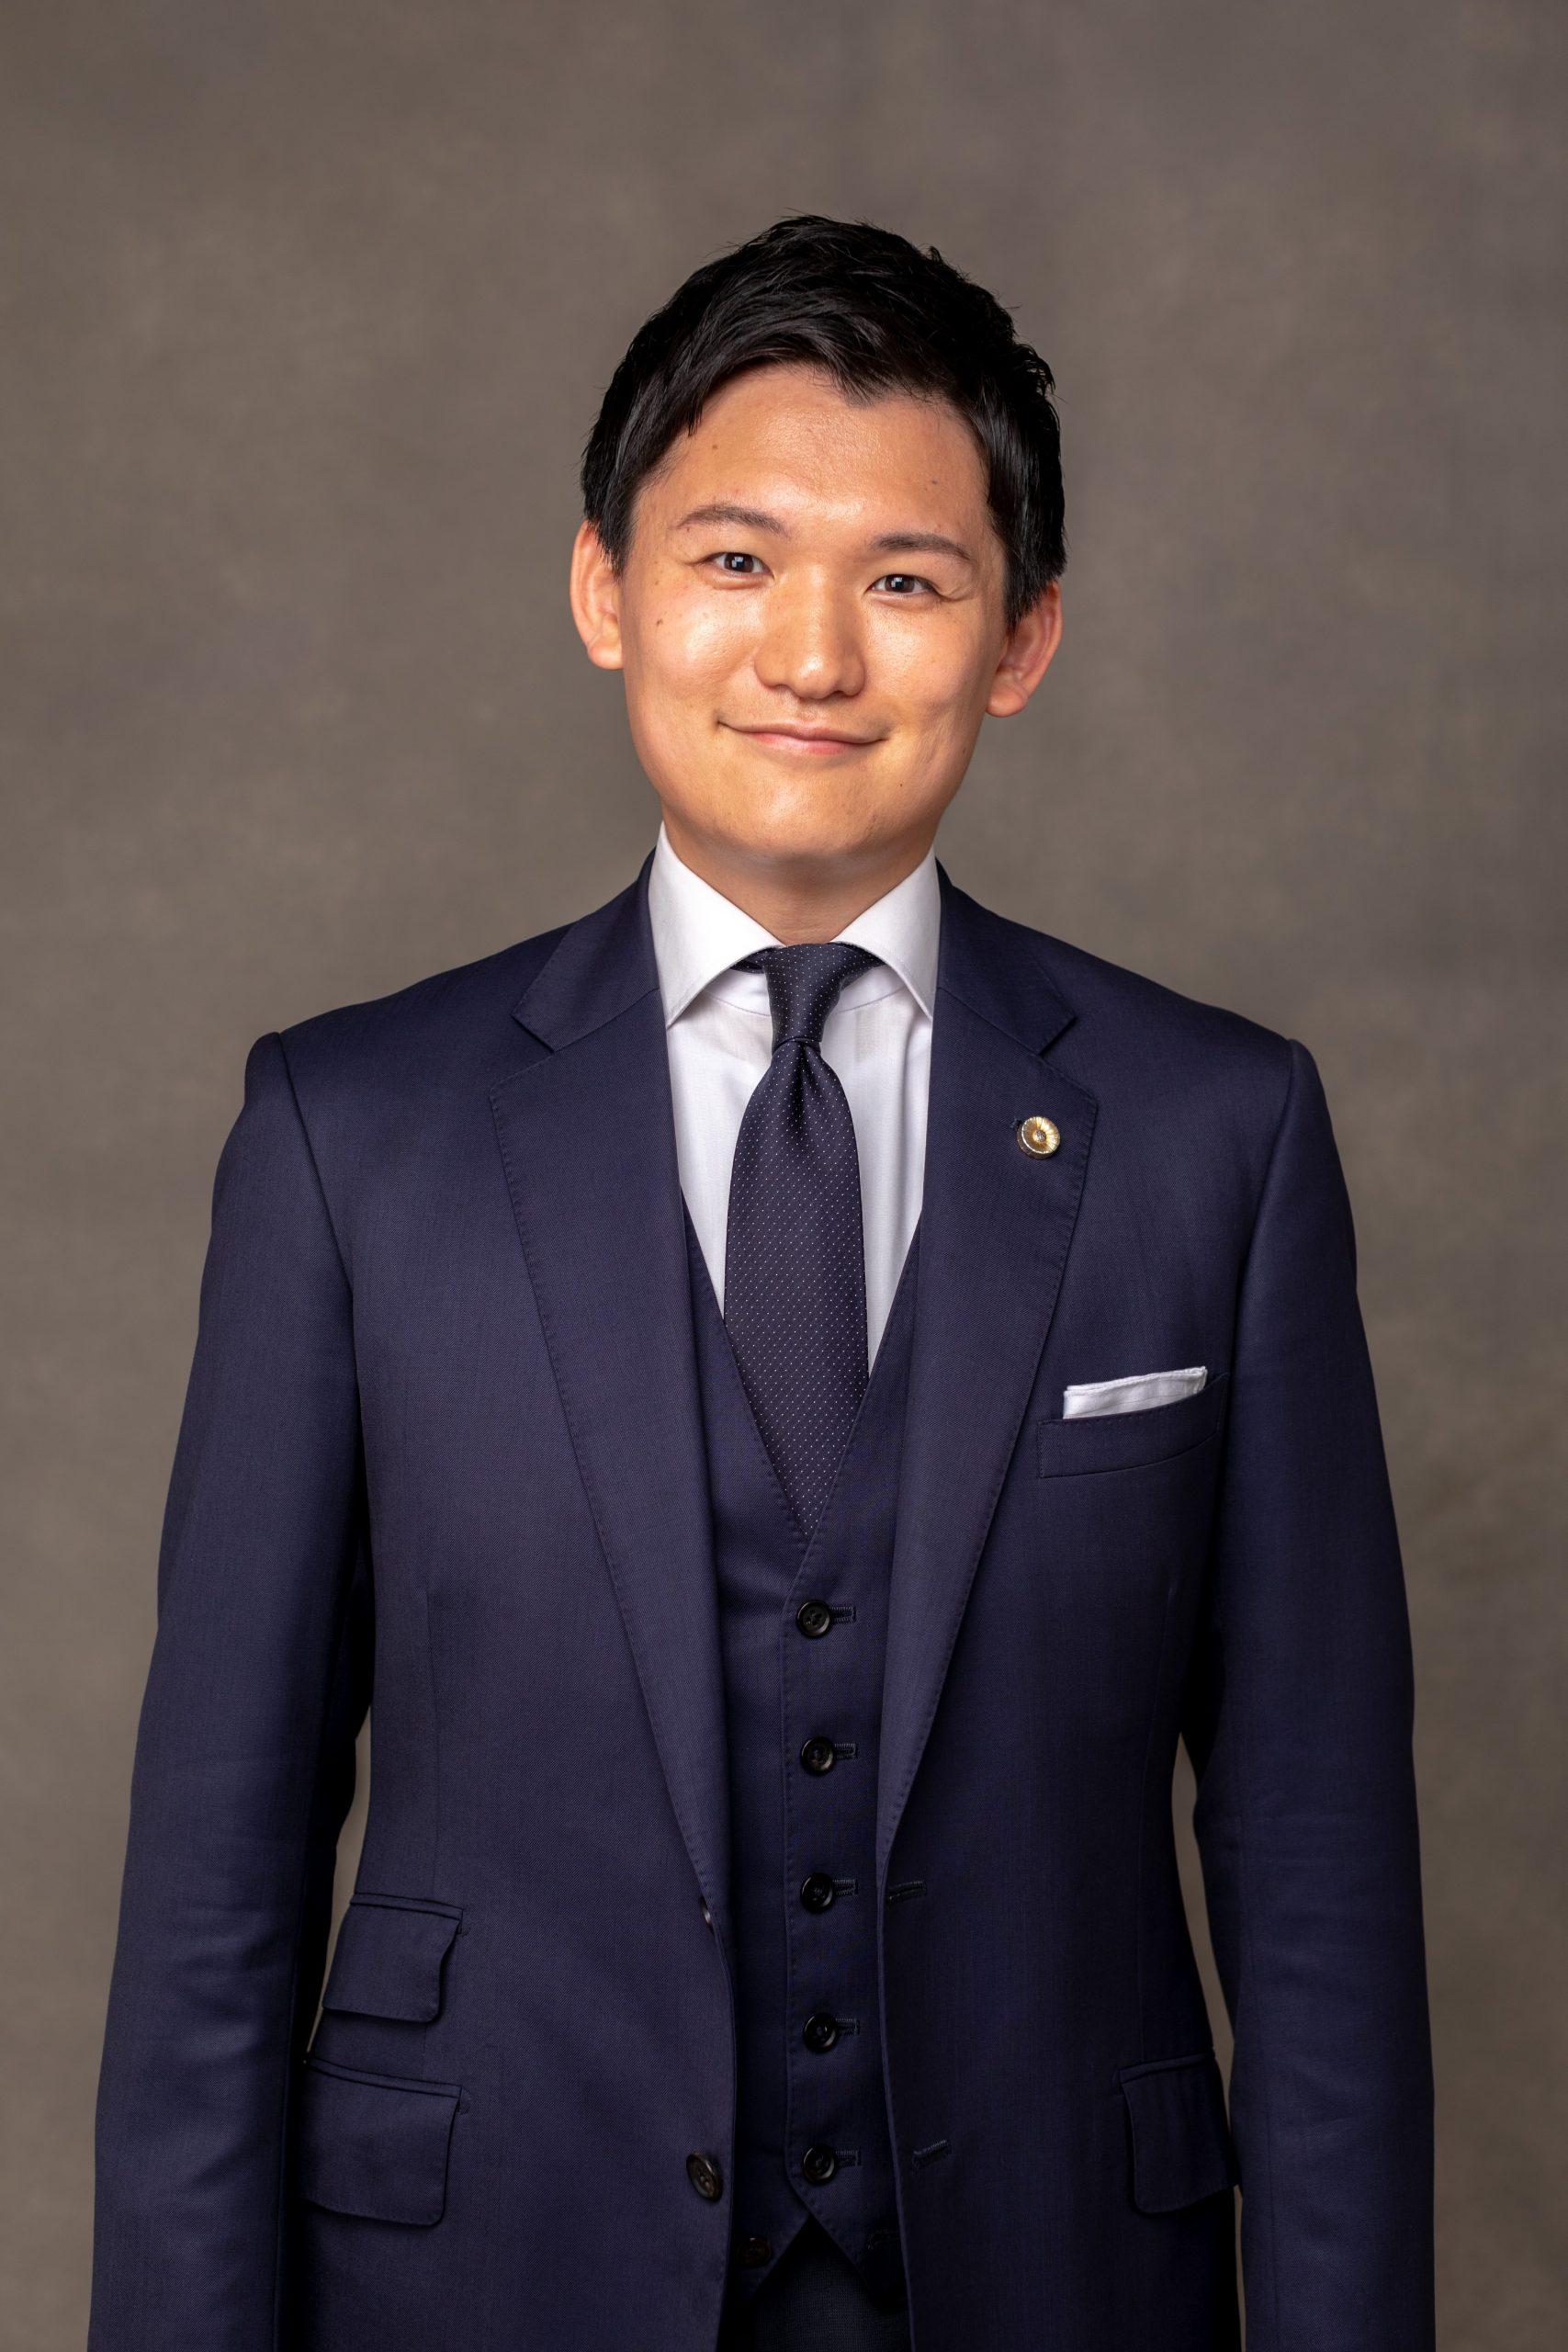 Ryu Ishida